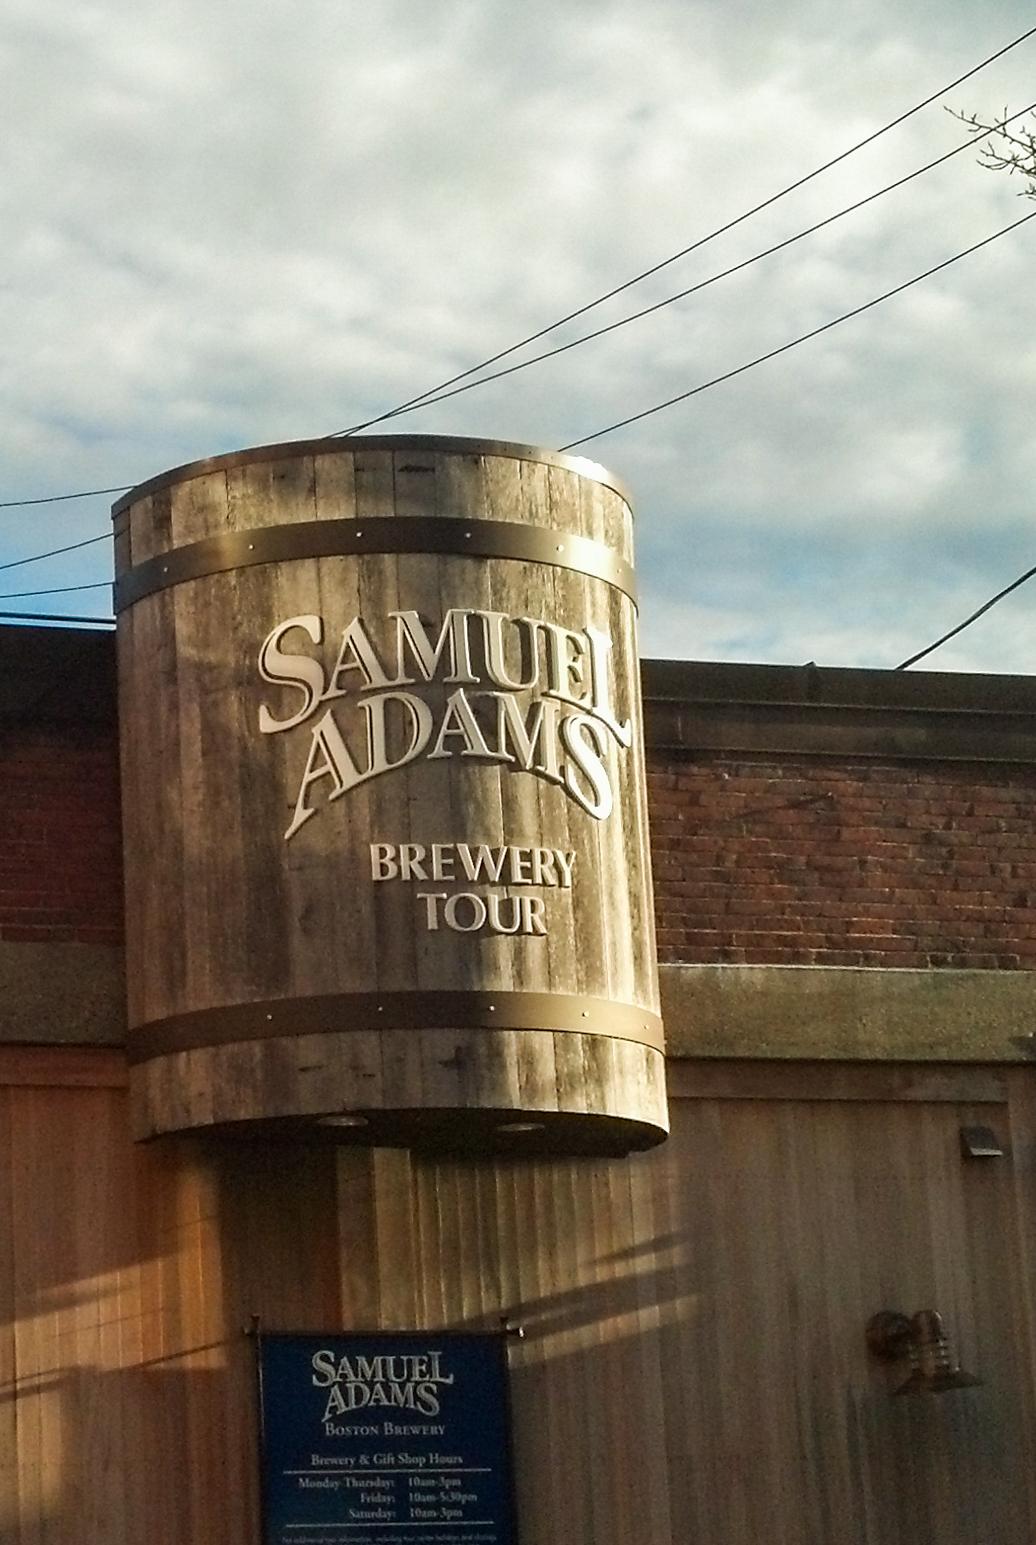 sam-adams-brewery-tour-exterior